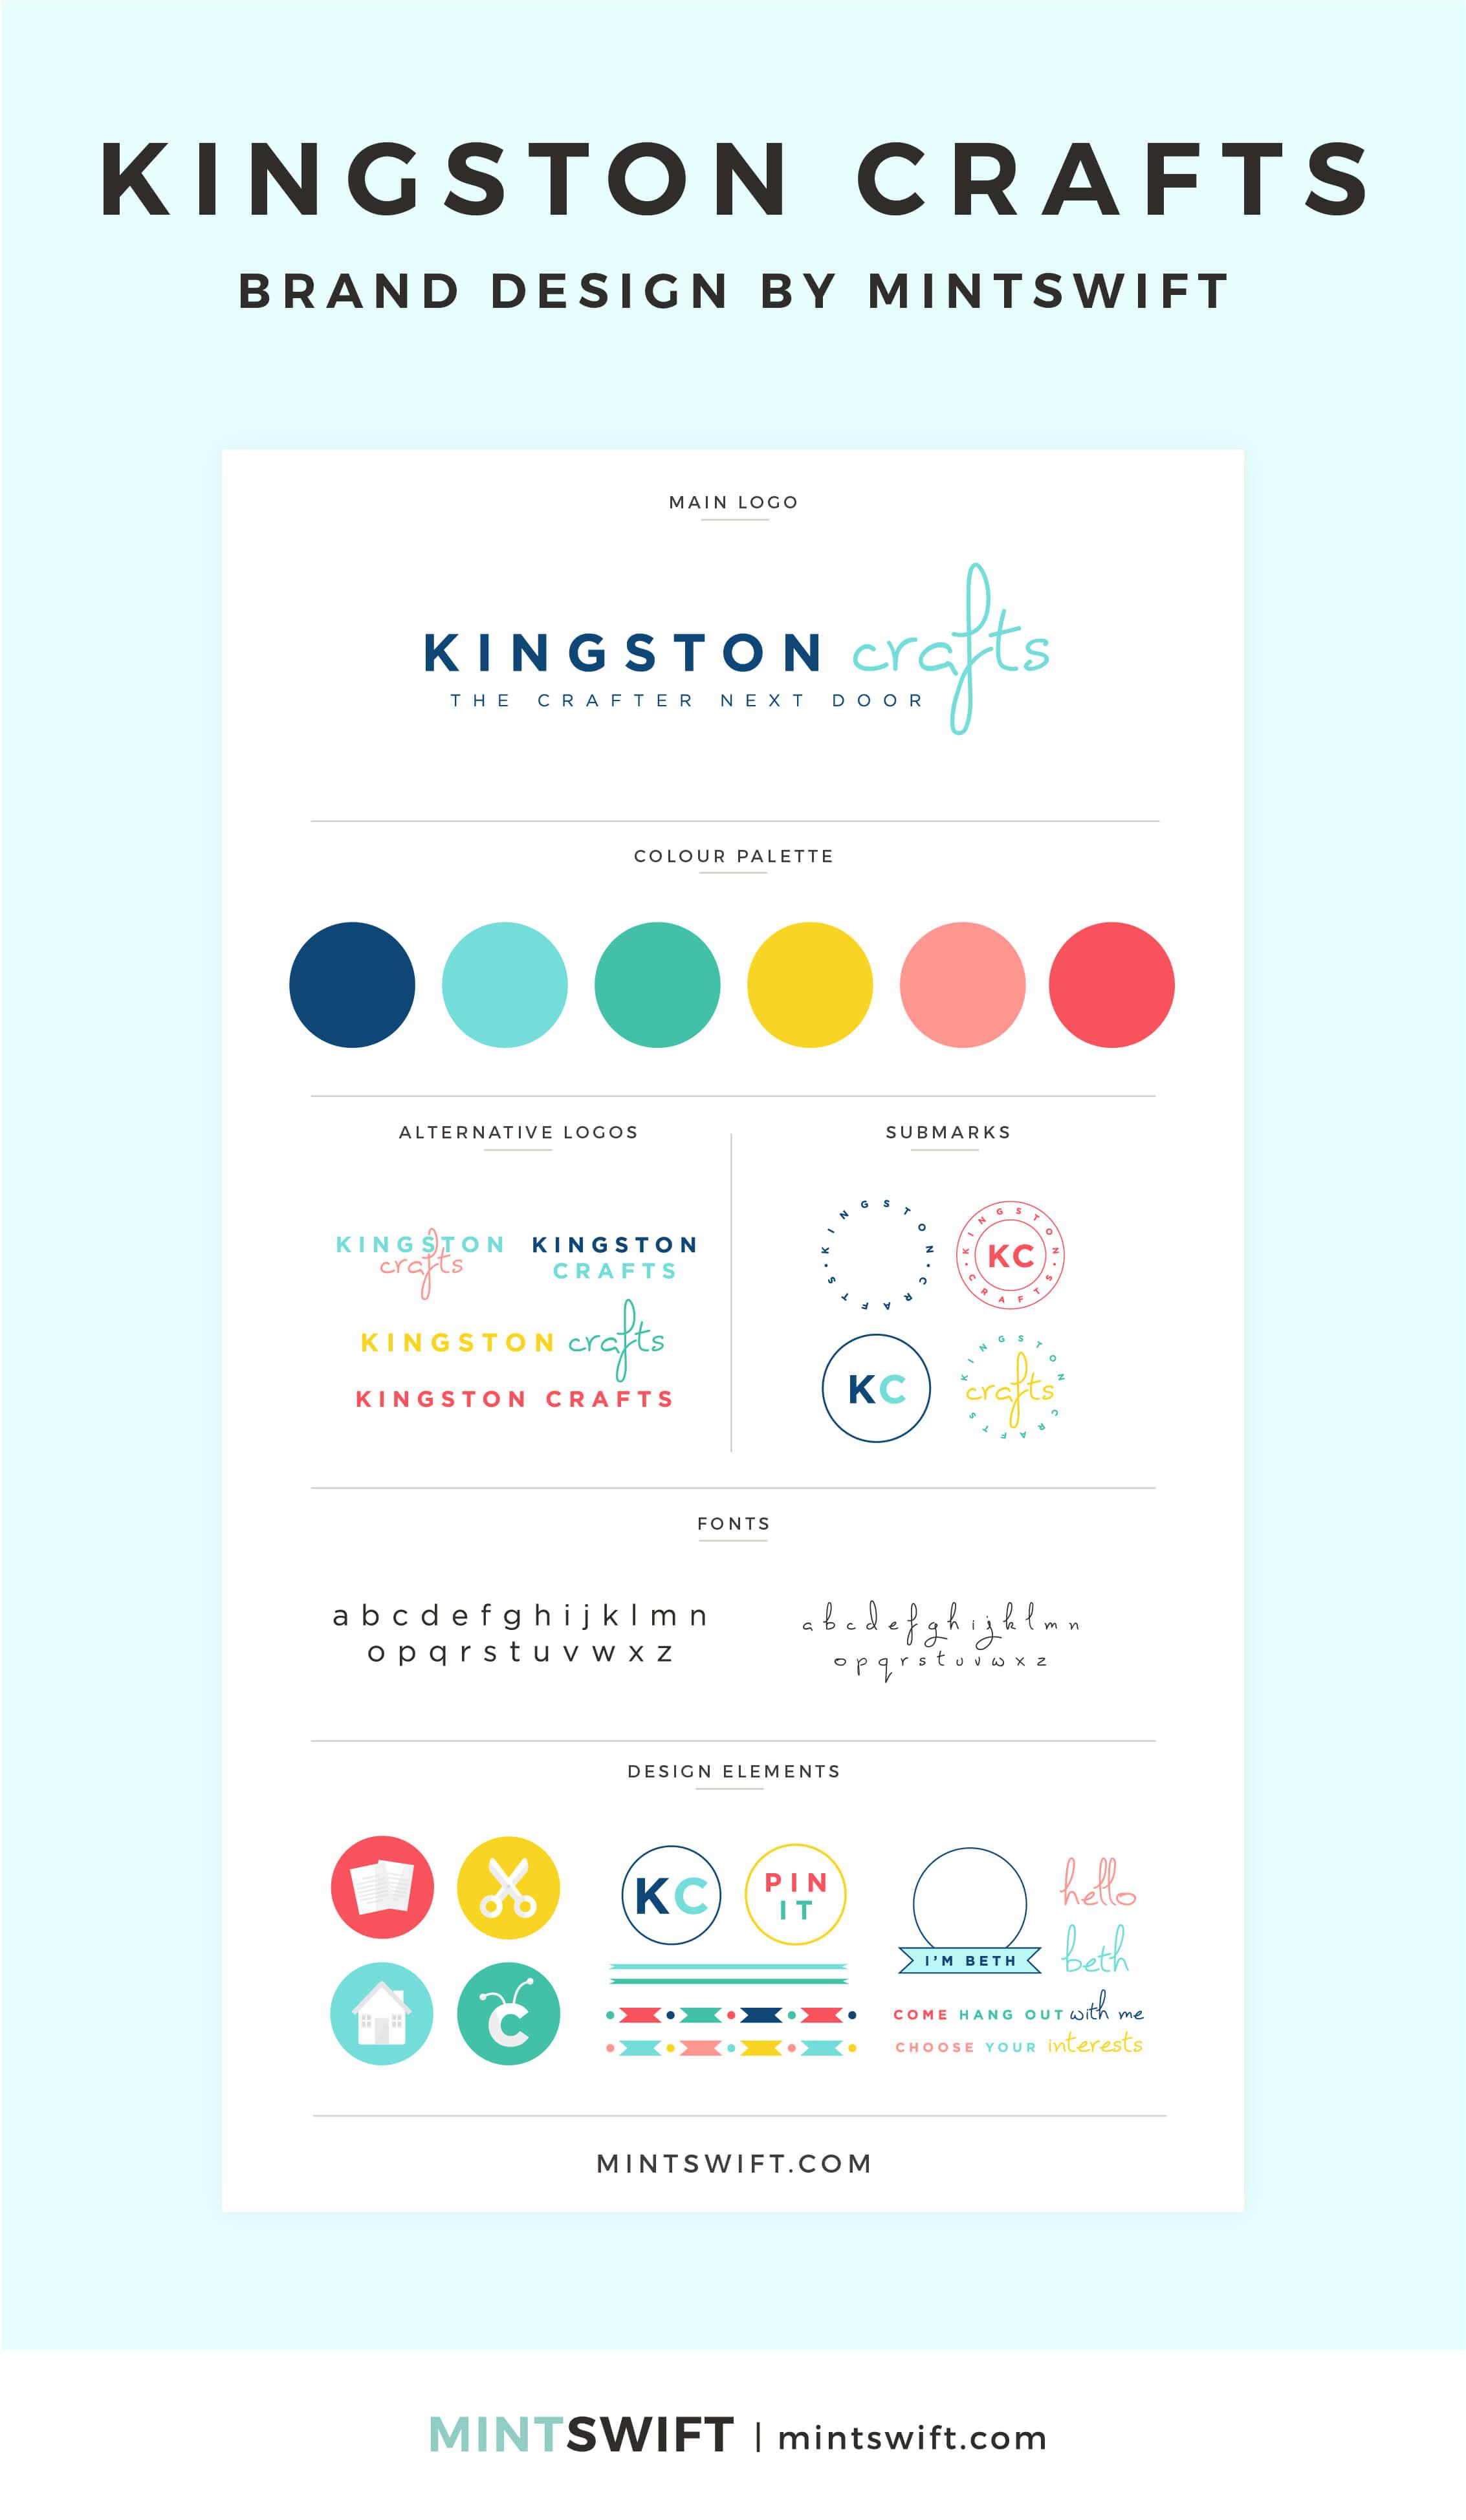 Kingston Crafts - Brand Design - MintSwift - Adrianna Leszczynska